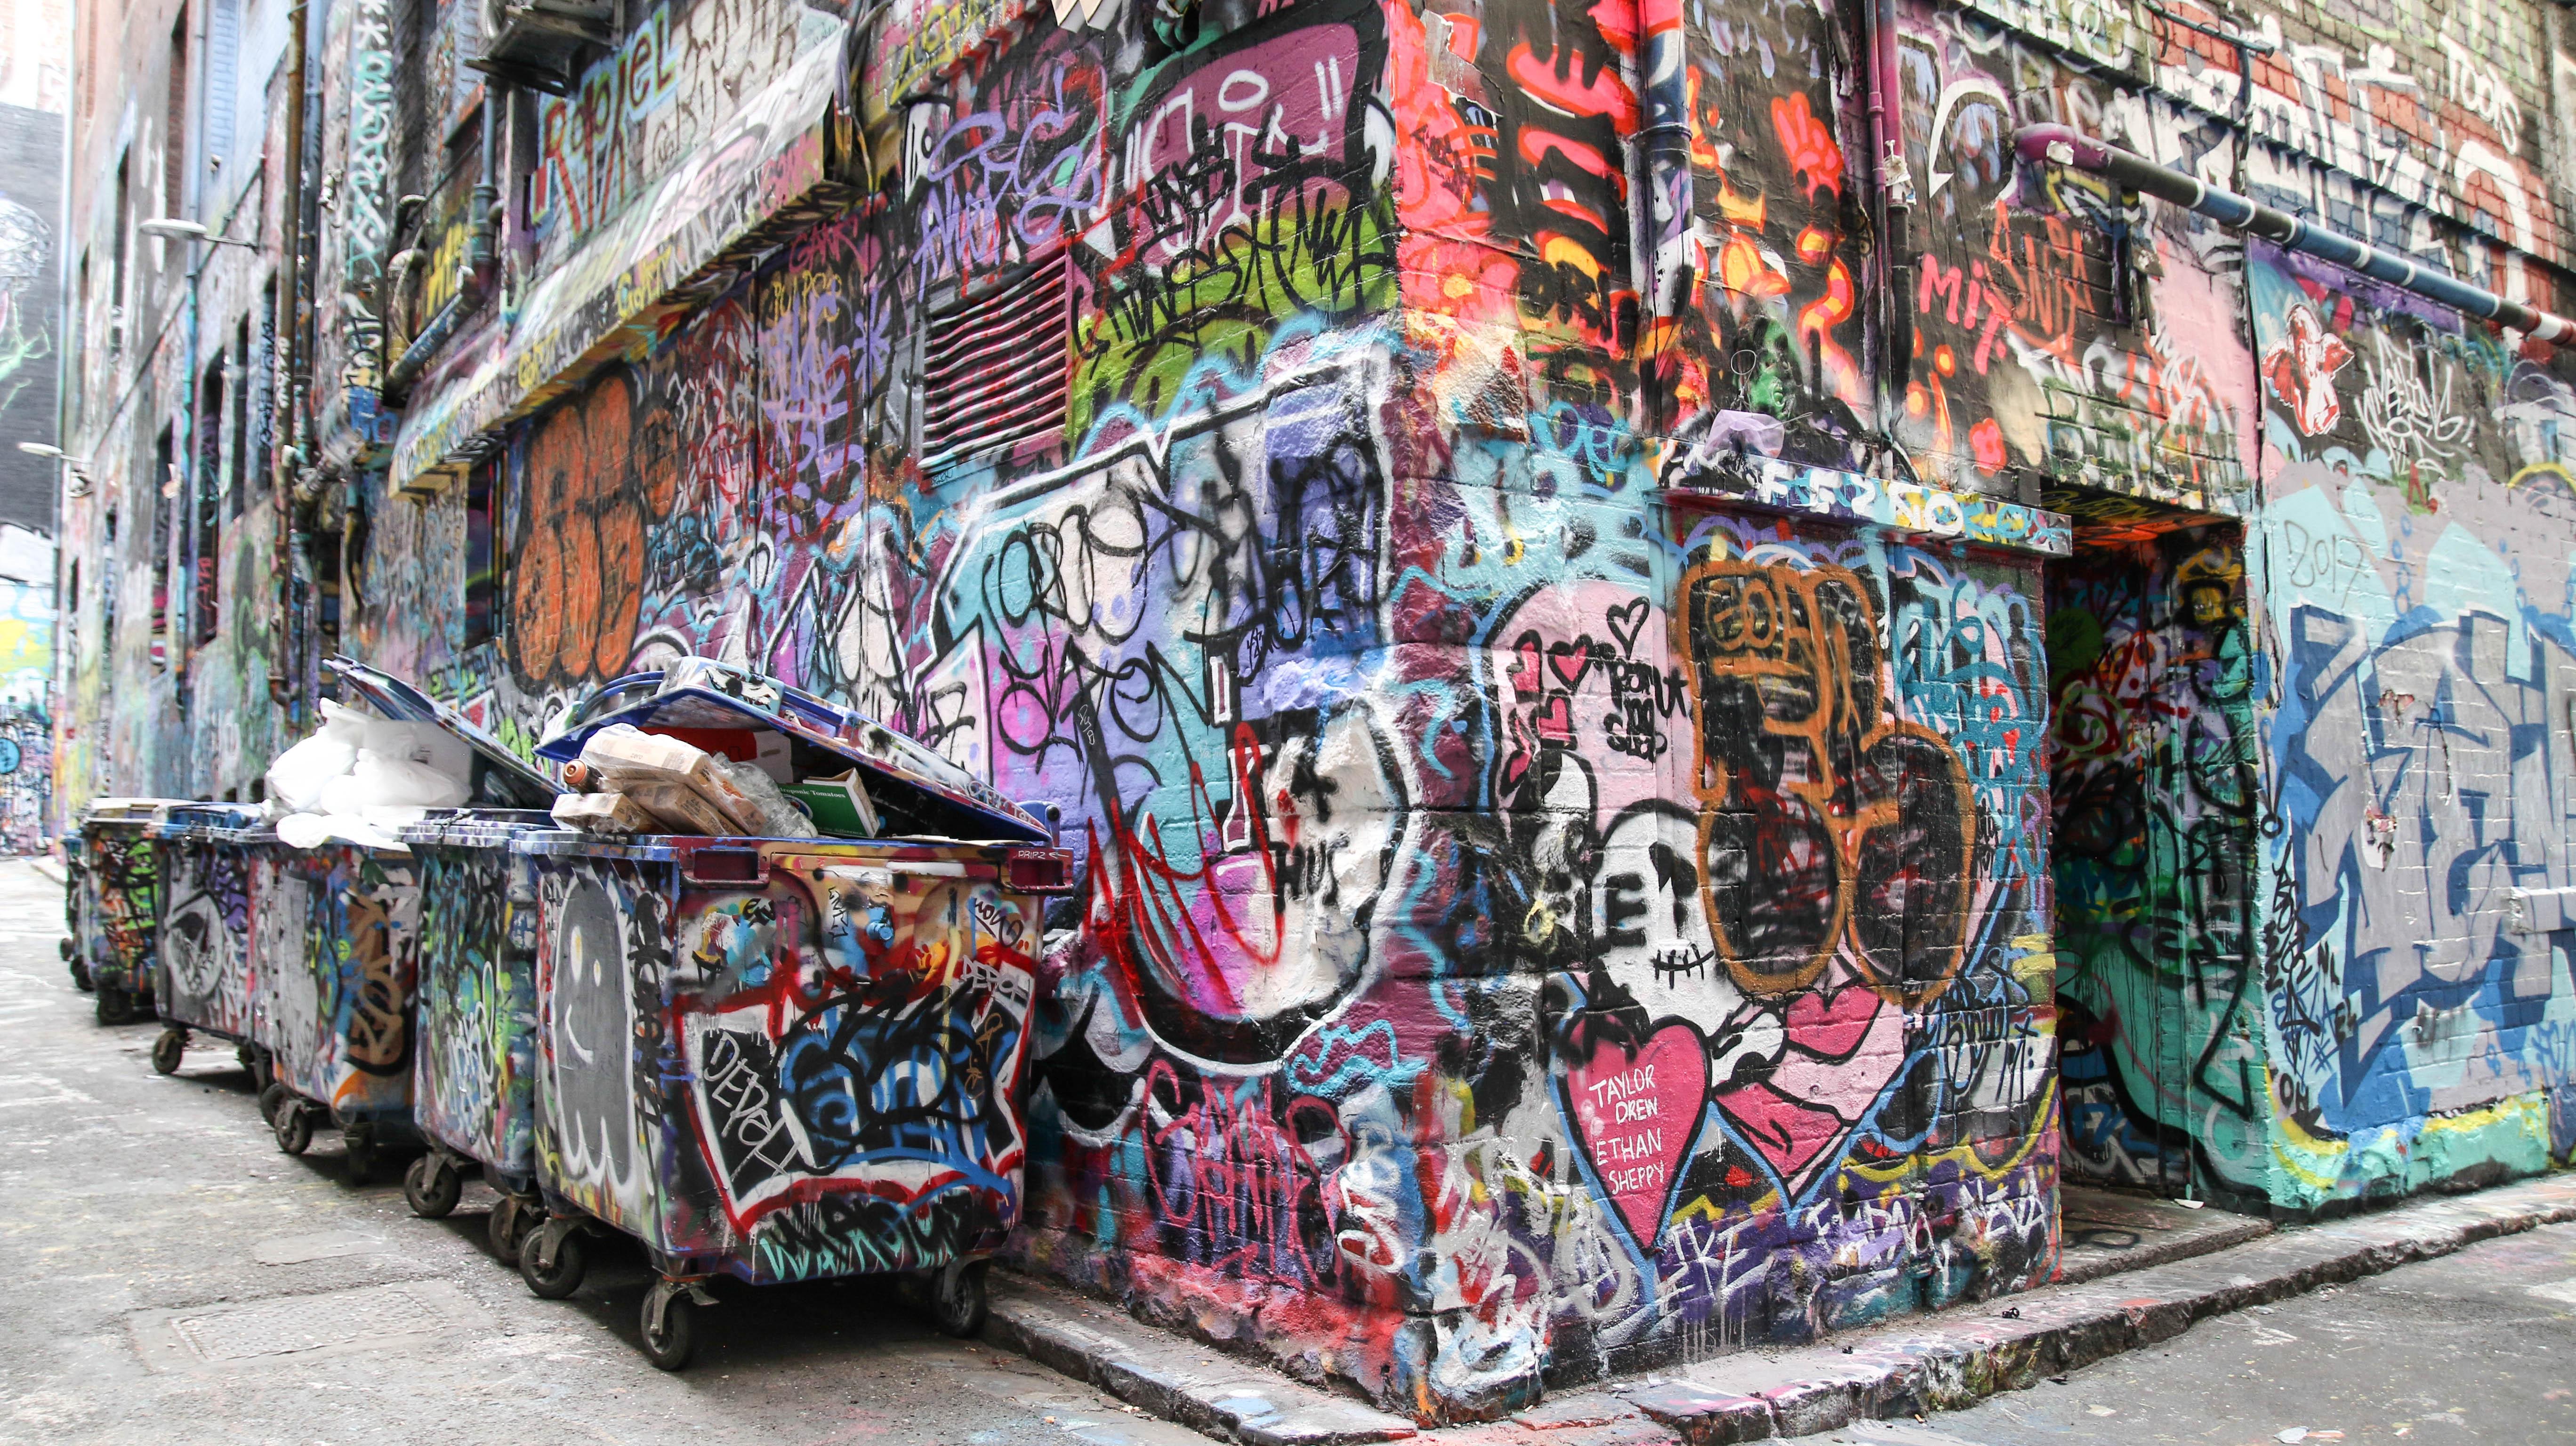 Hosier Lane Graffiti Rubbish Bins - JamesWatling KiwiPassport.com